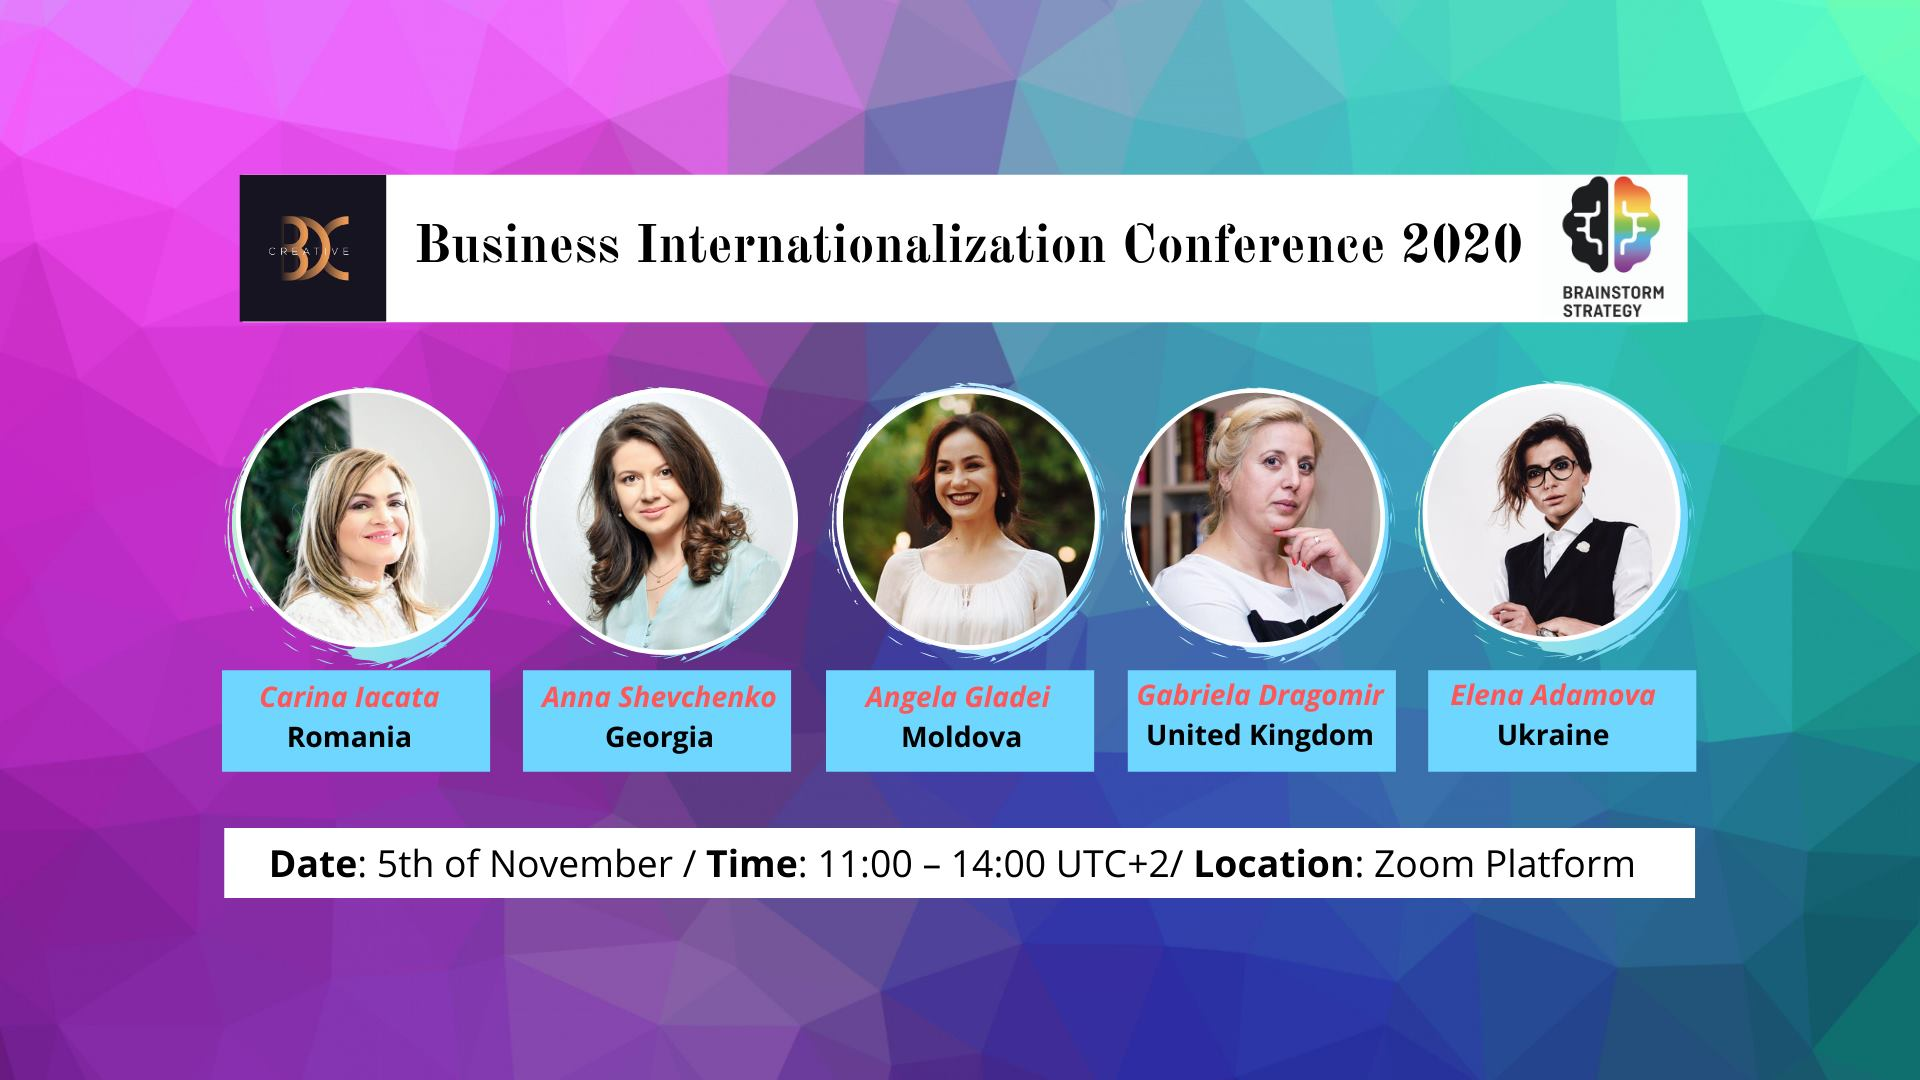 Business Internationalization Conference 2020